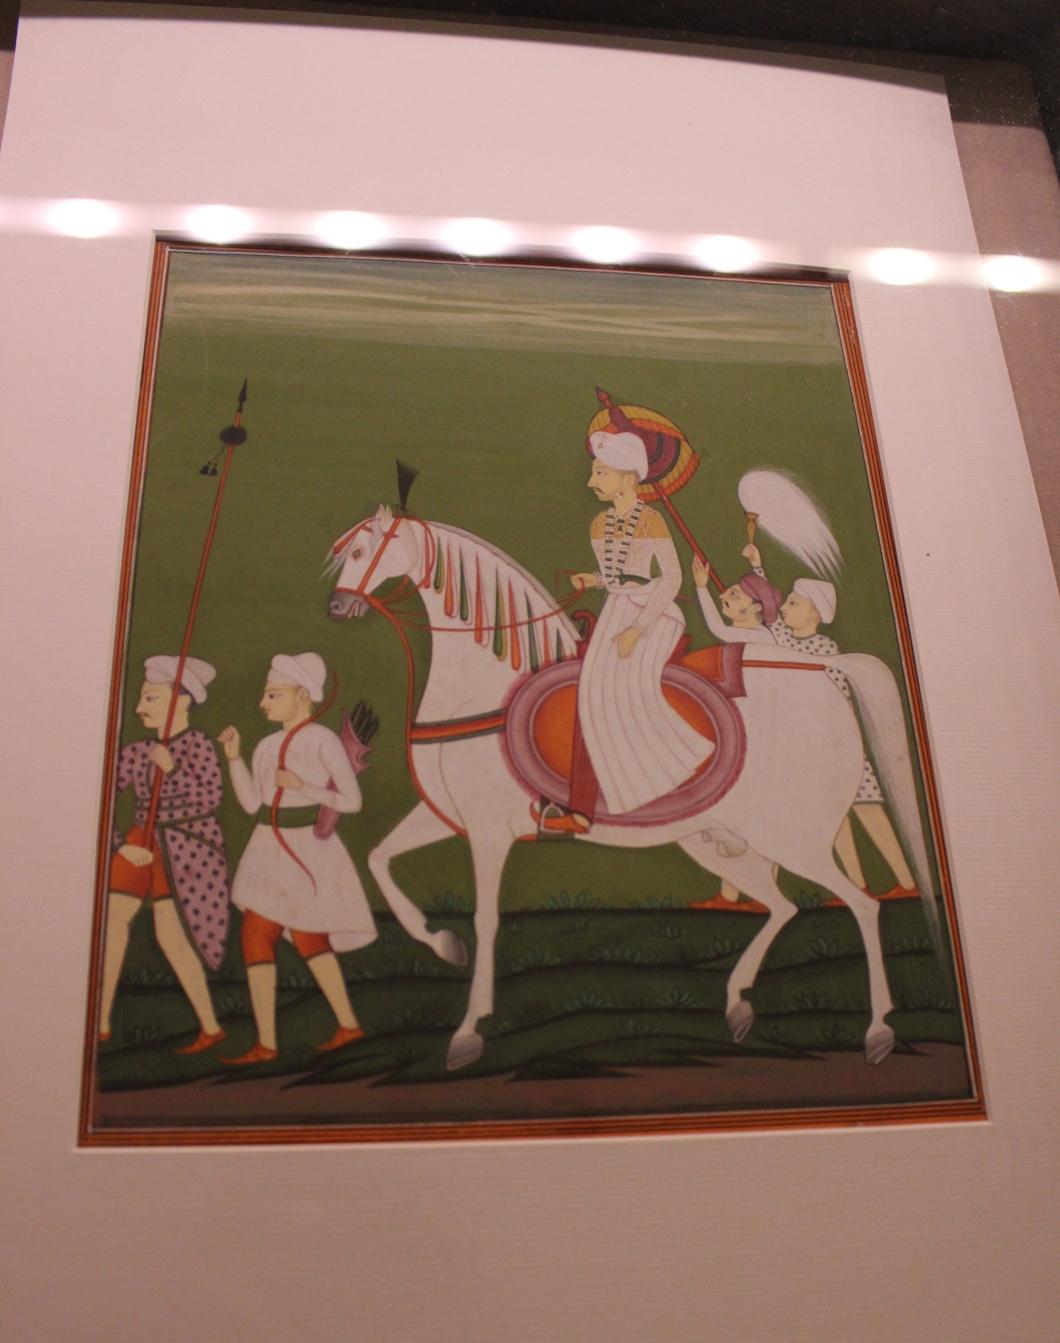 Balaji Bajirao alias Nanasaheb Peshwa: Deccani, Satara, Copy made in 1854 at Satara (Indian Miniature Painting - Photograph in mirandavoice.com)